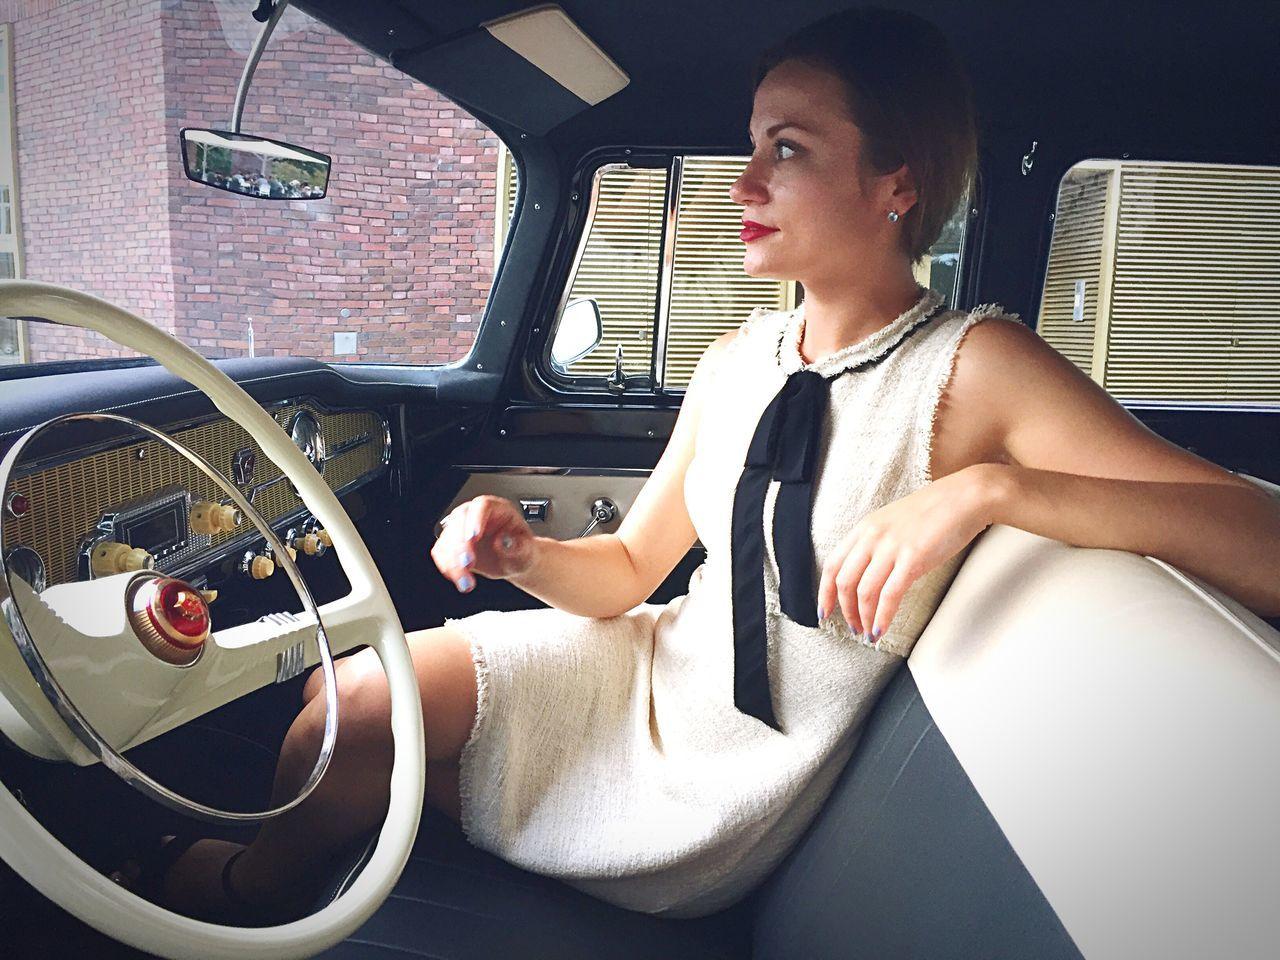 Fashion&love&beauty Fashion Photography Dress Luxury Luxurylifestyle  Oldtimer Style Stylish Sixties Model Russian Girl Russian Beautiful Beauty Faces Of EyeEm Women Of EyeEm Hi! Hello World Elégance cGirl rWoman aWomen Who Inspire You ou